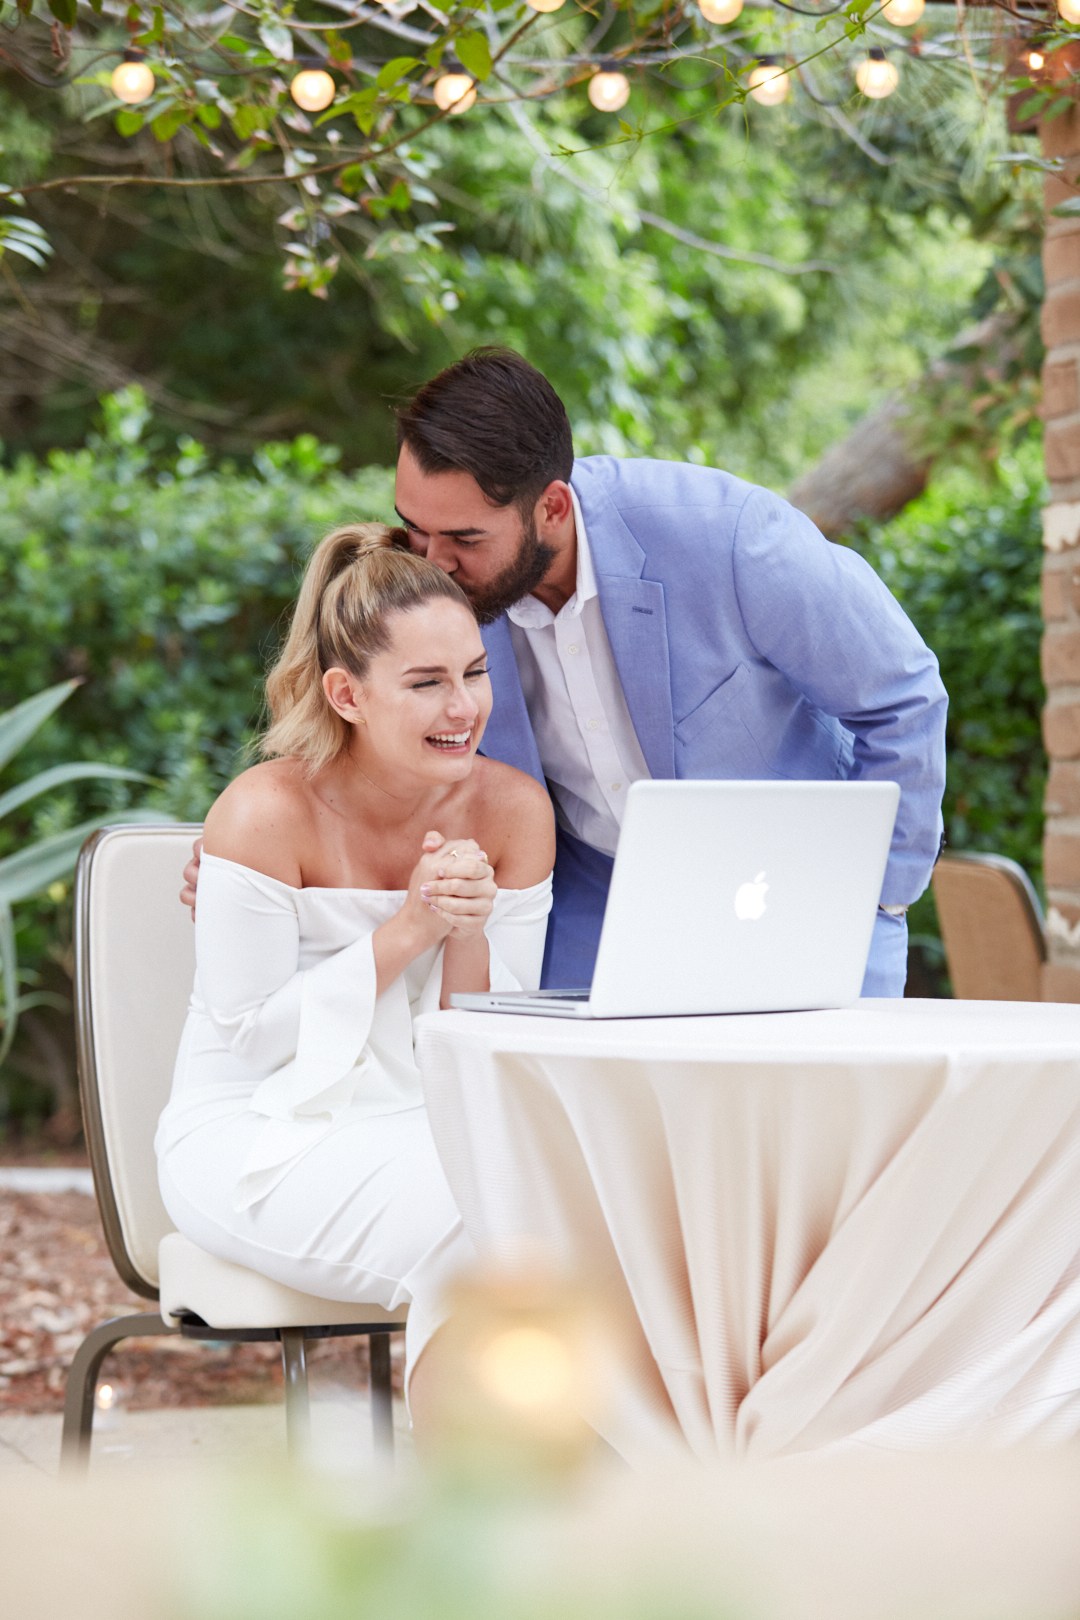 Wedding Proposal Ideas in Estancia La Jolla, San Diego, CA